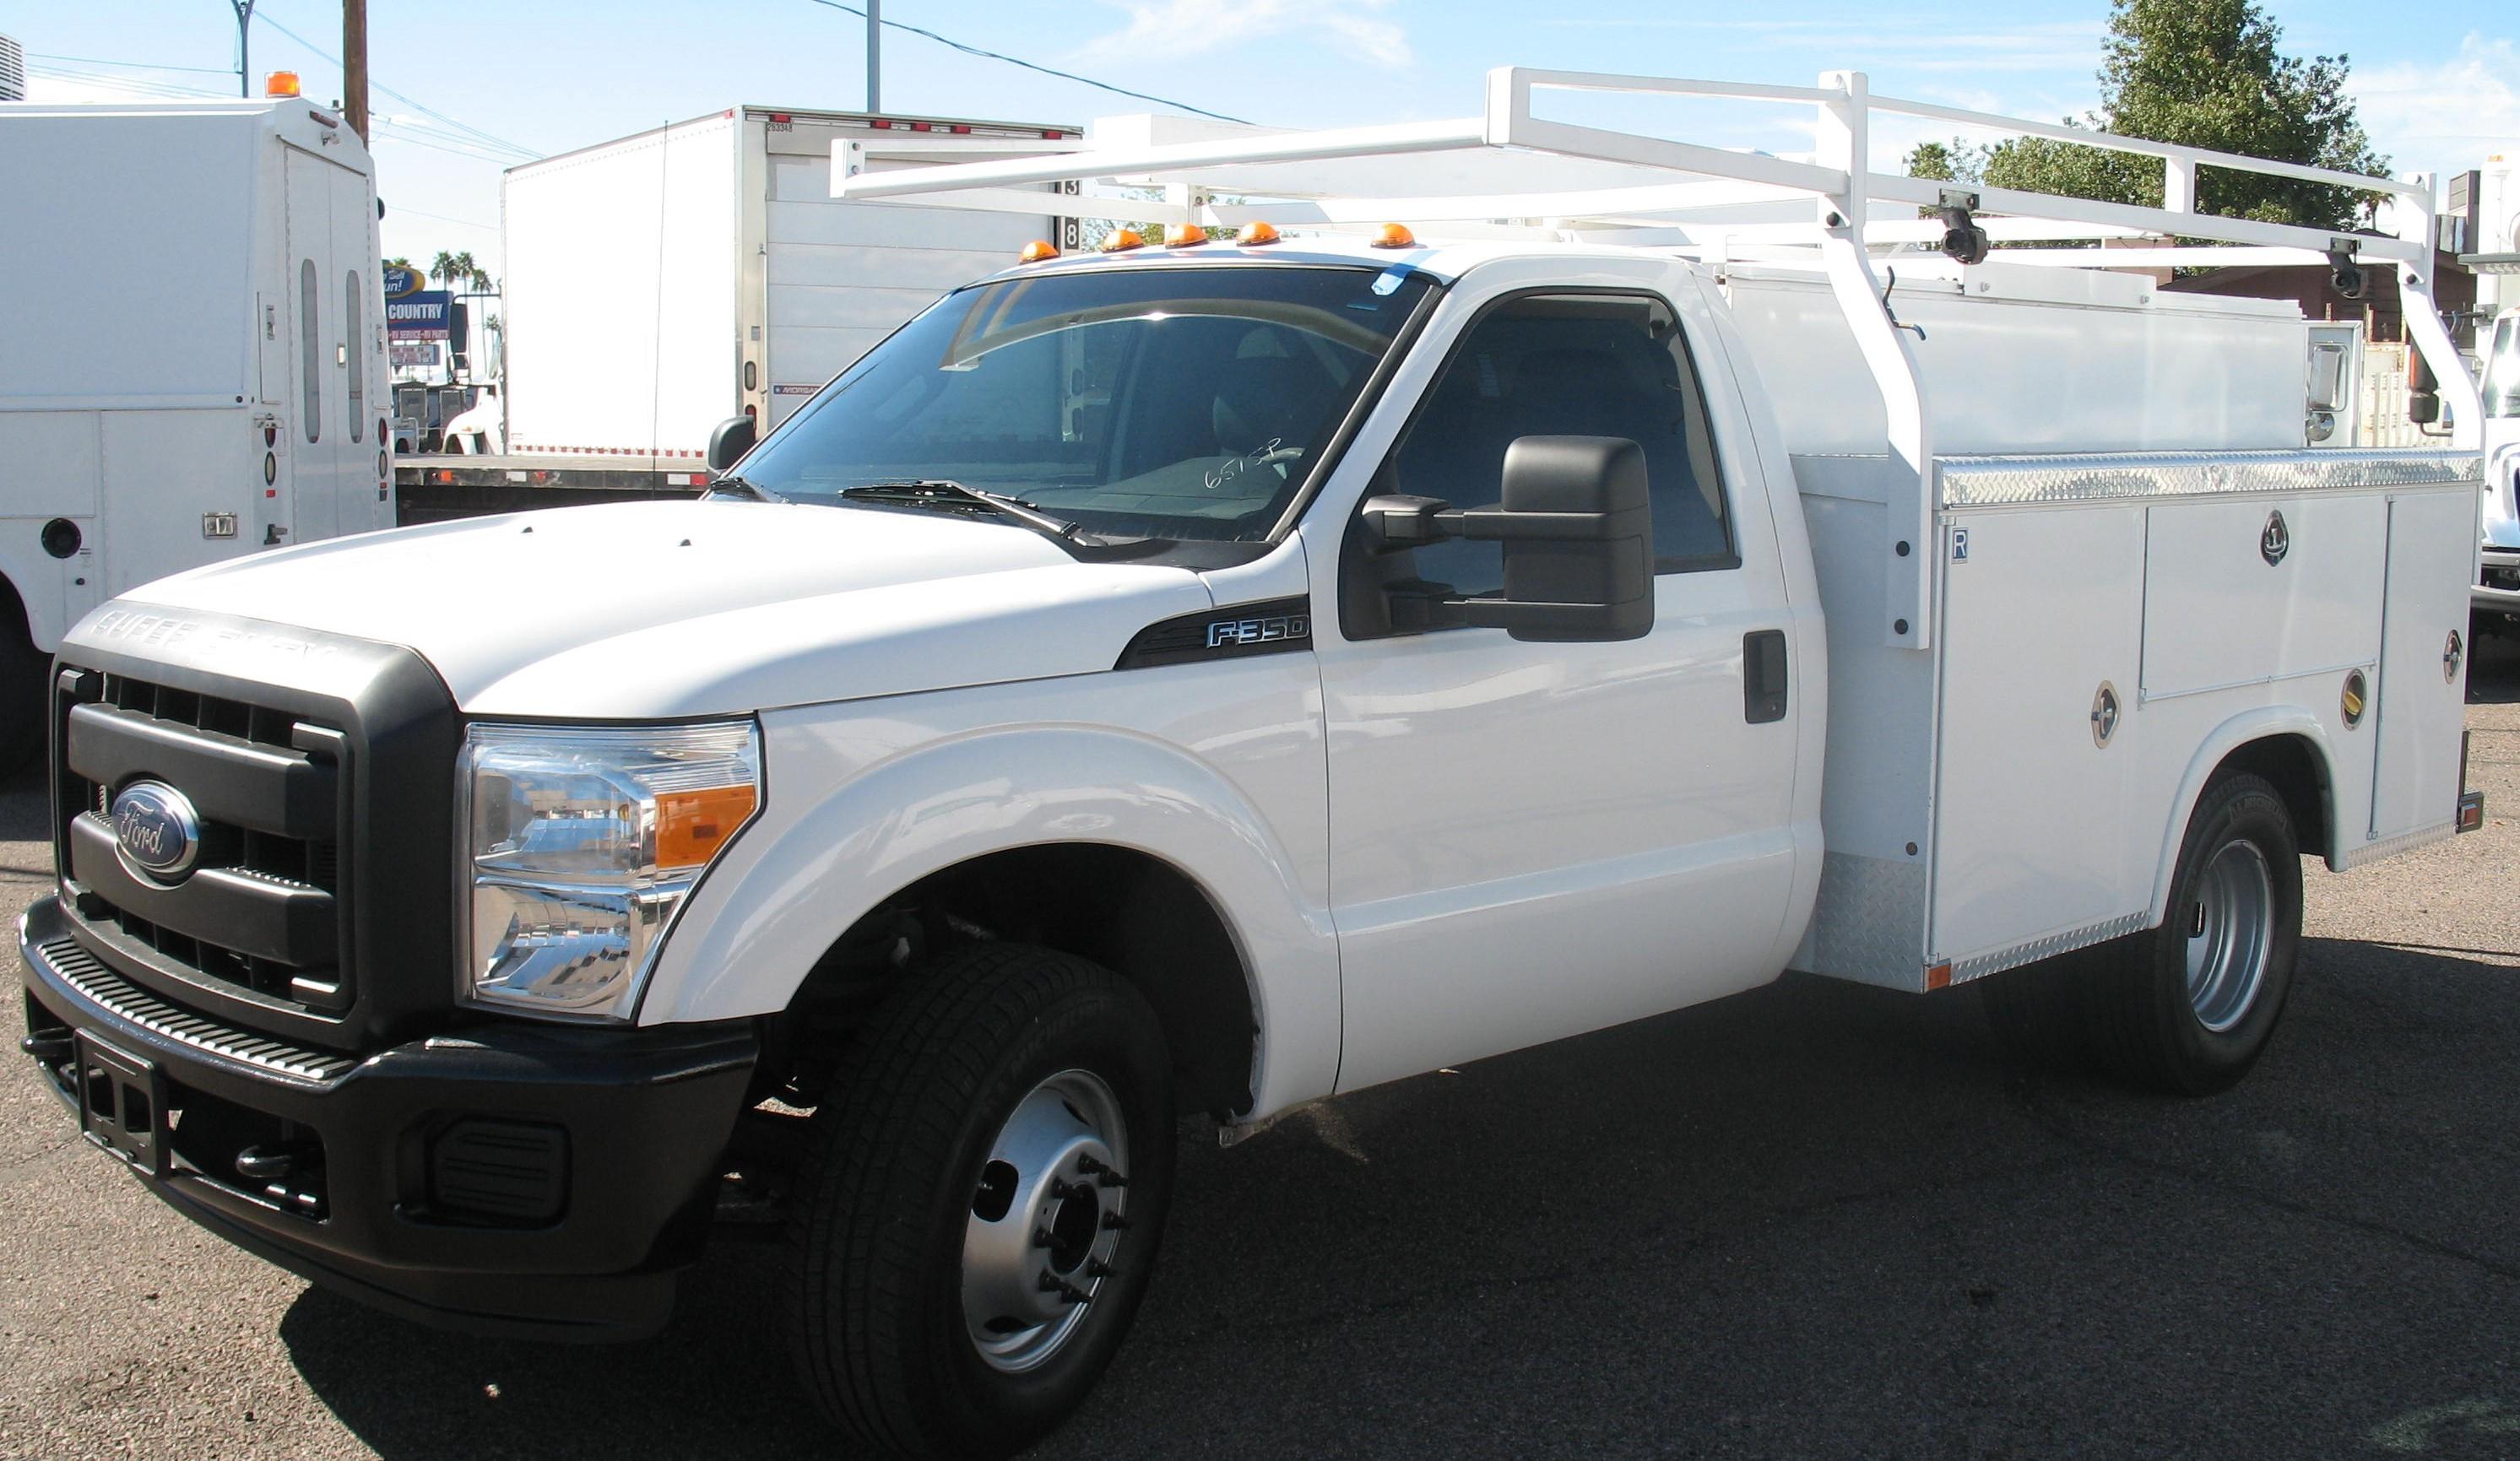 Used, 2015, Ford, F-350 SD XL, Service / Utility Trucks